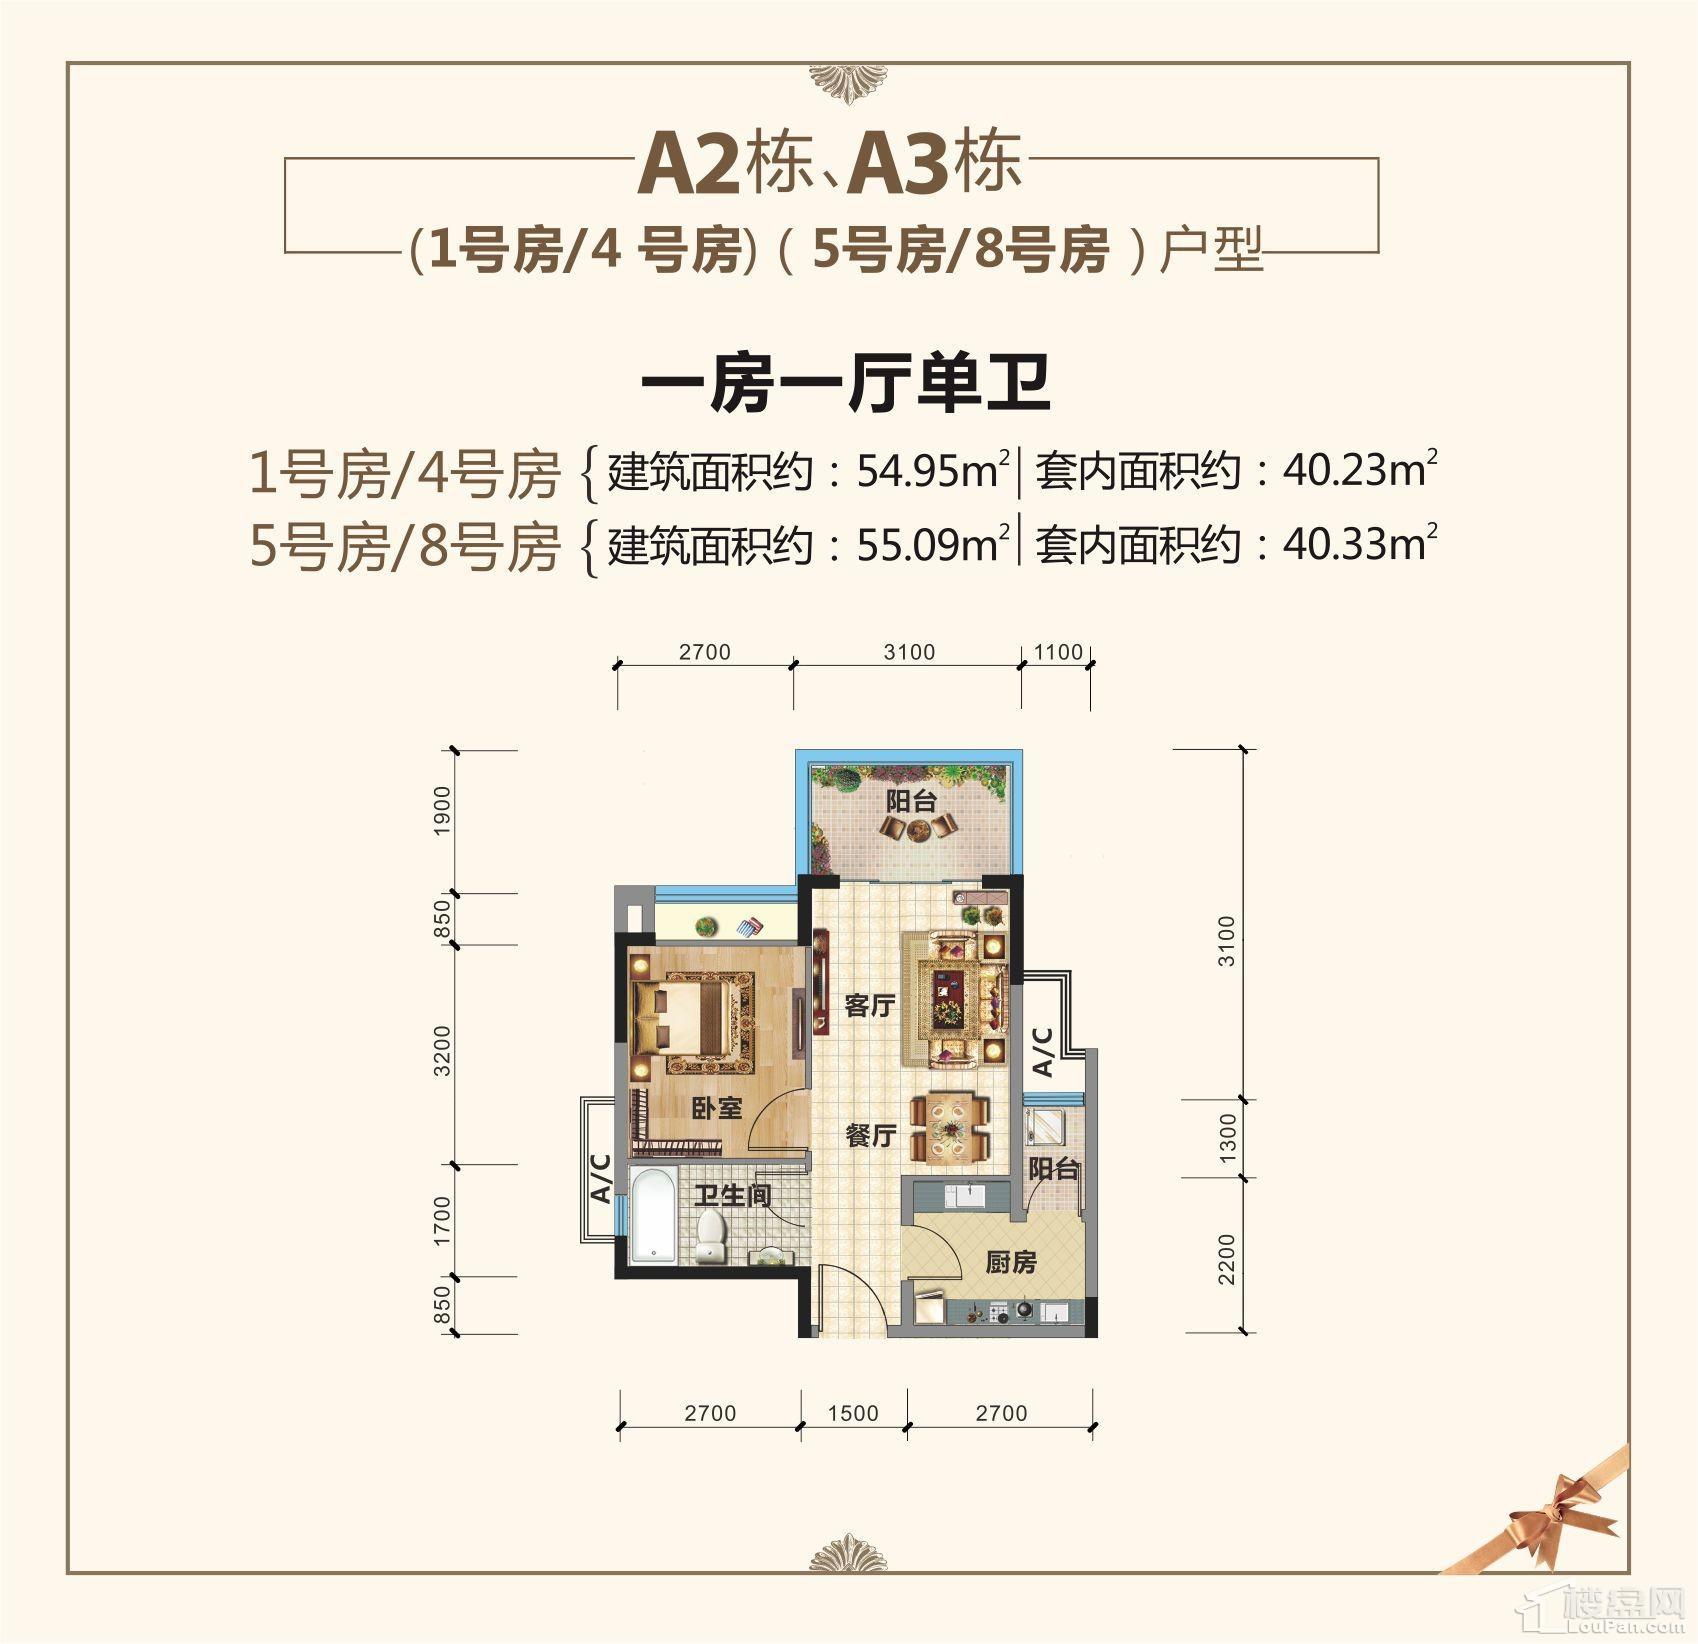 A2栋、A3栋1号房/4号房、5号房/8号房户型